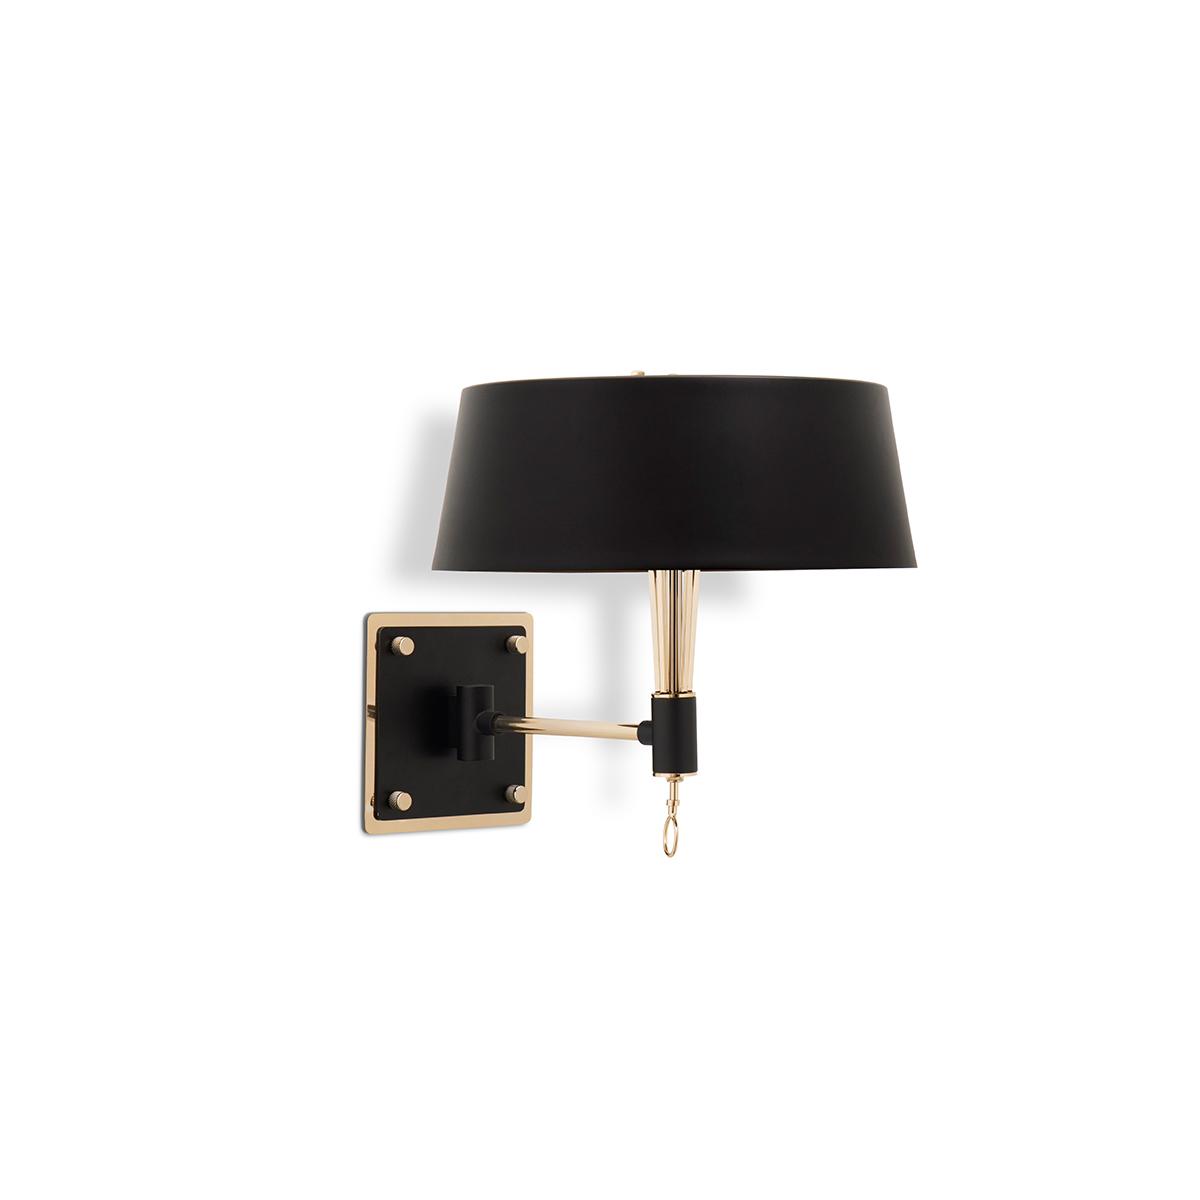 MILES WALL LAMP